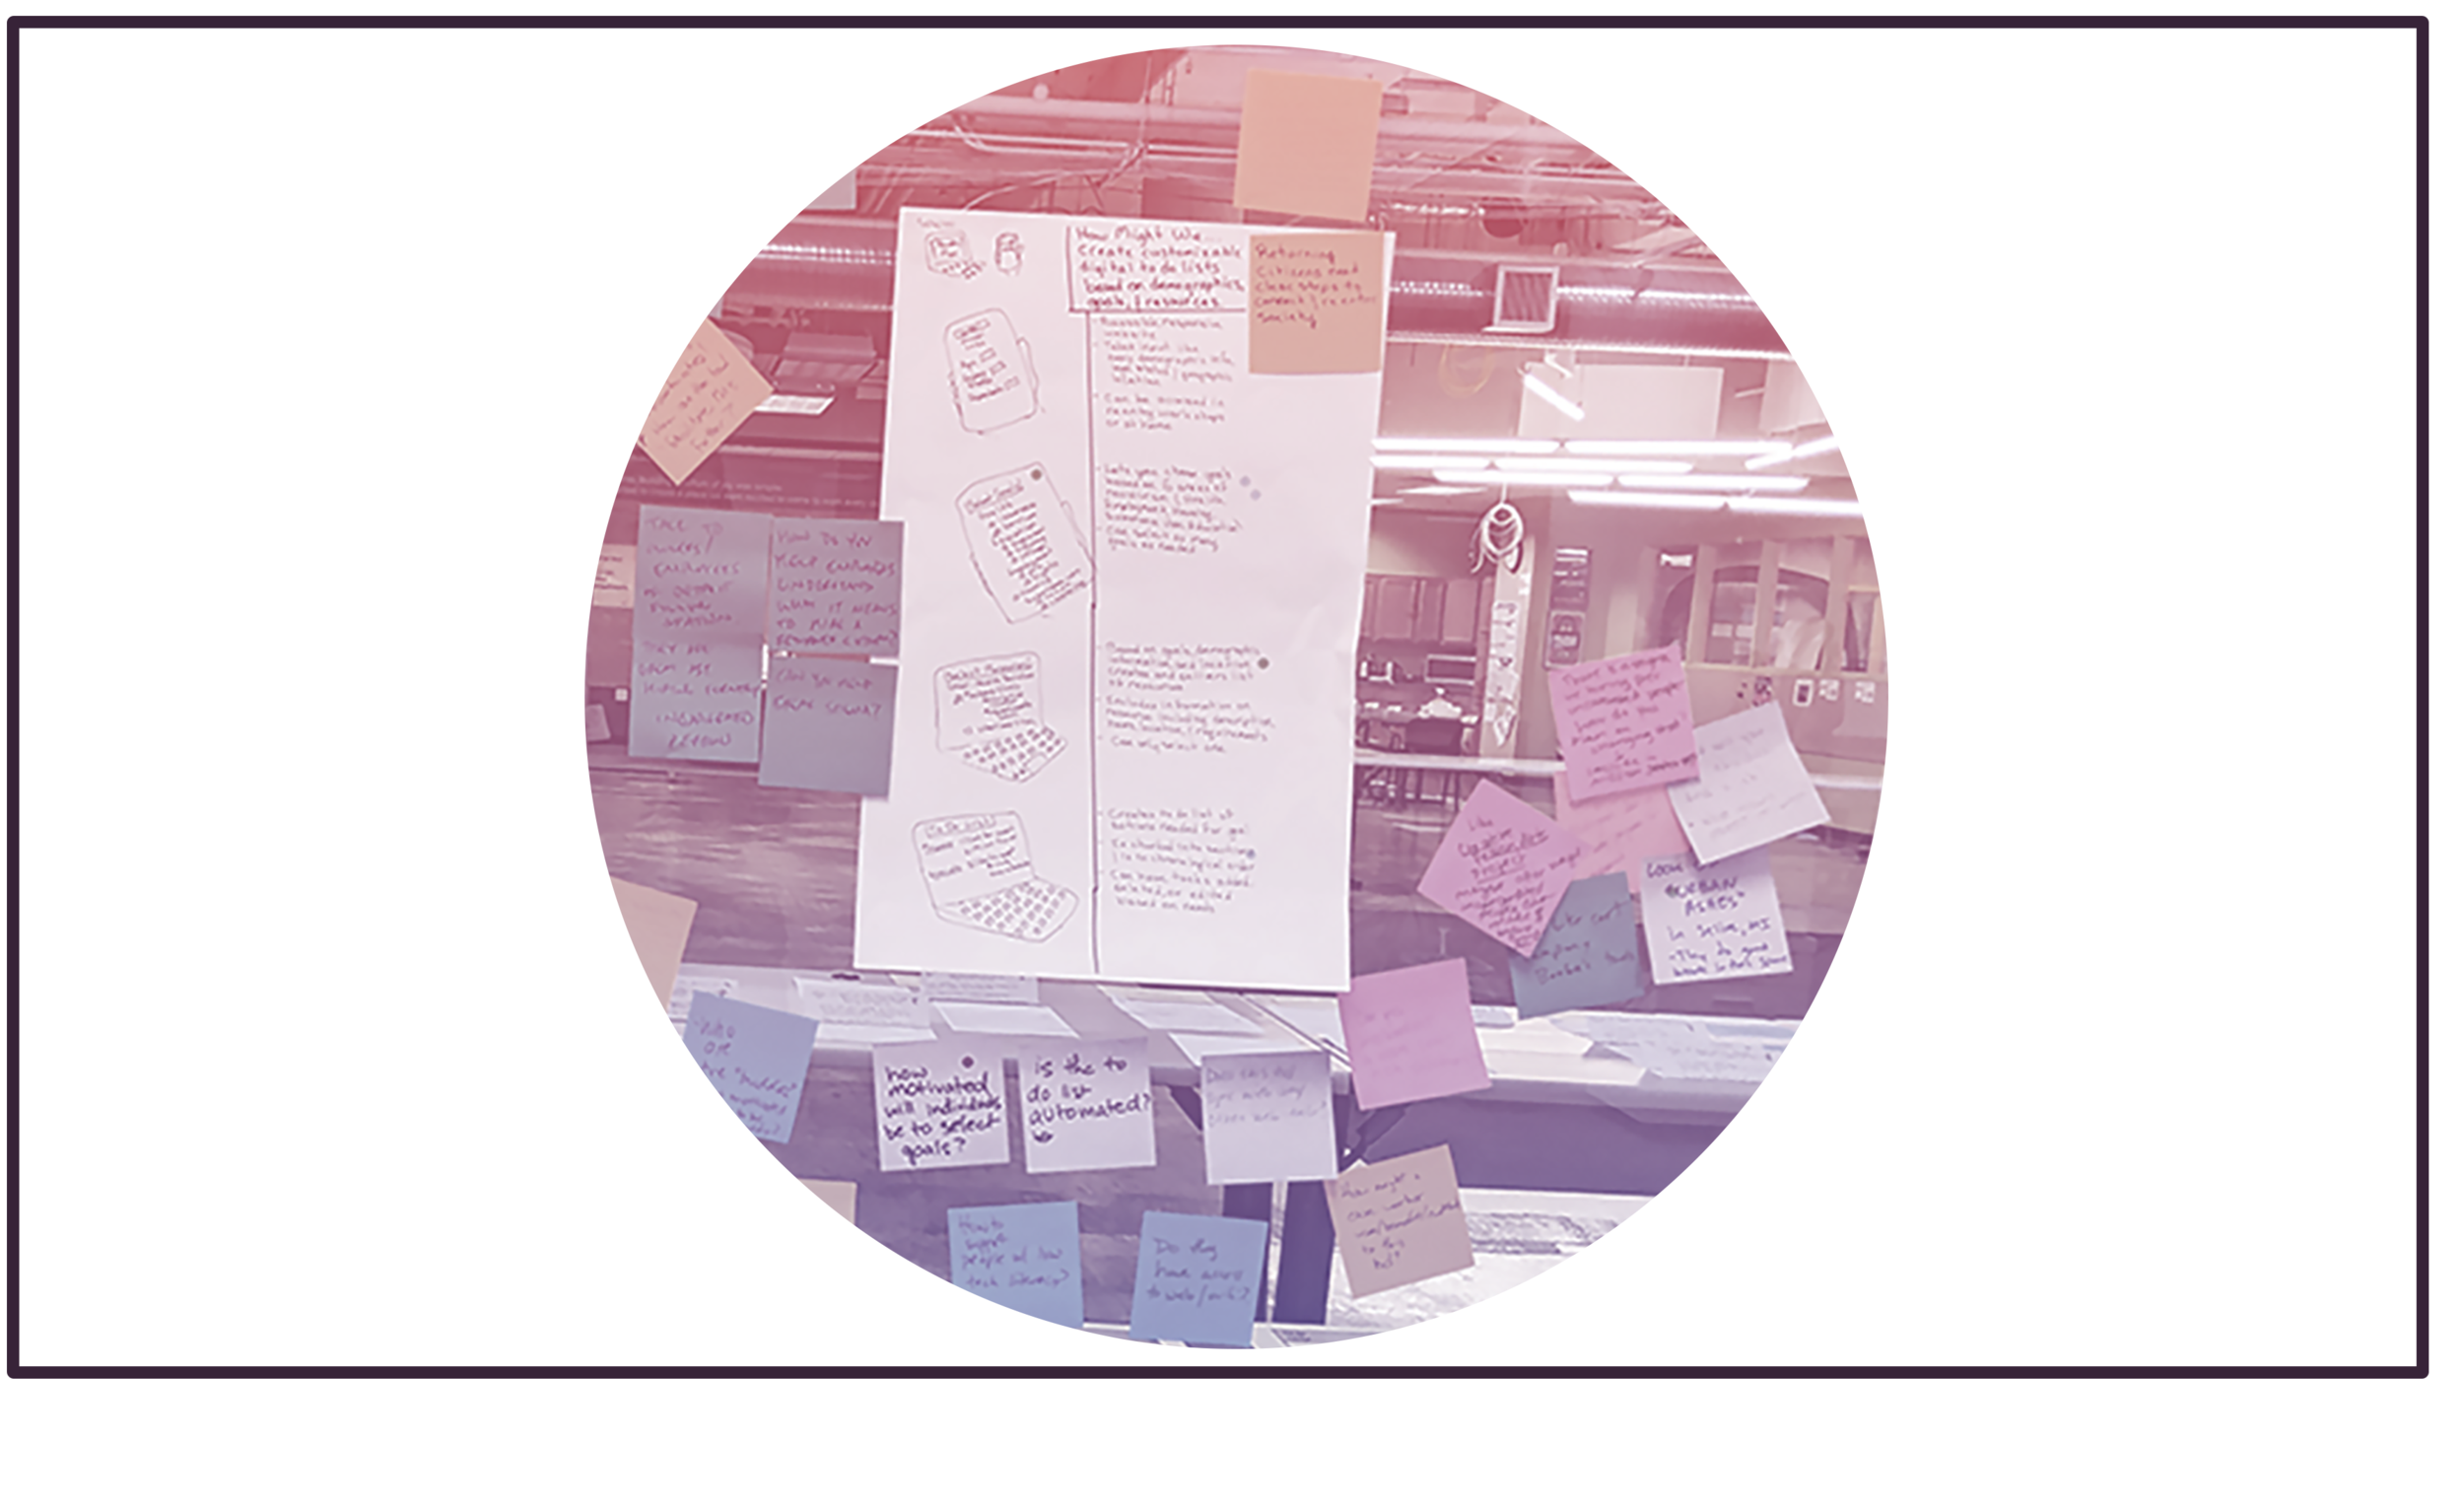 Innovation In Action |  Design Competition & Workshop